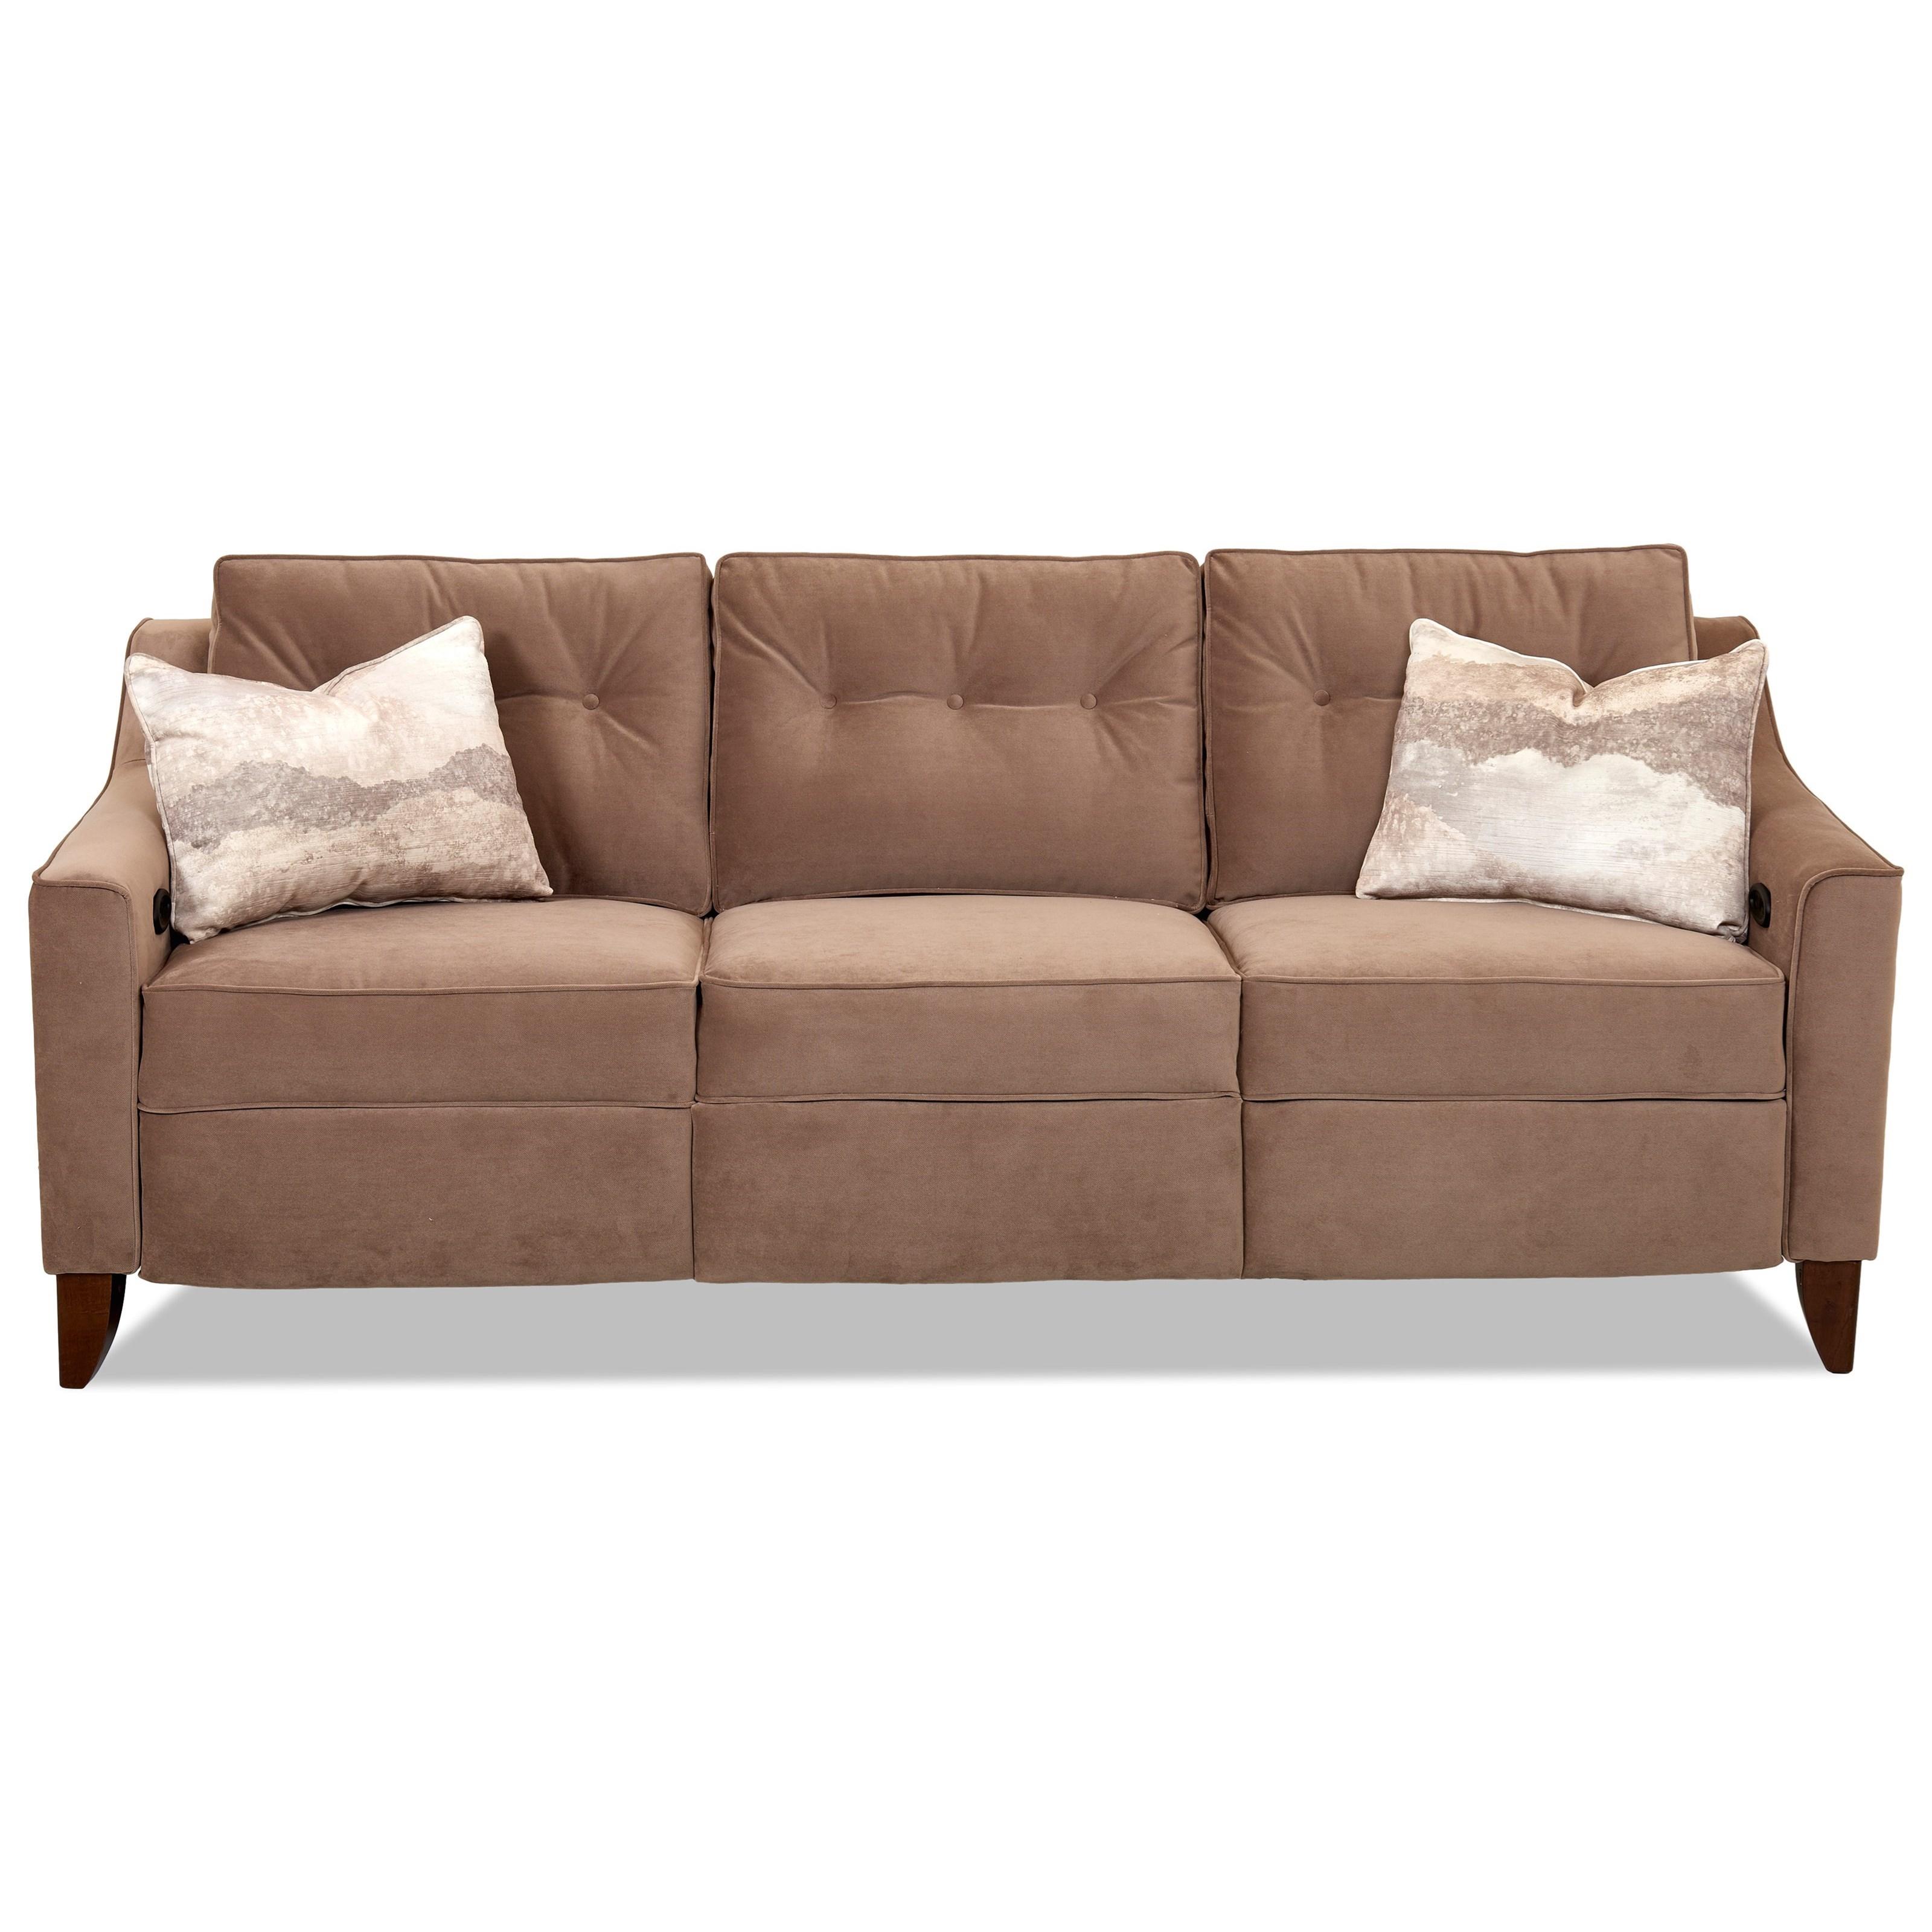 Audrina Power Reclining Sofa by Klaussner at Lapeer Furniture & Mattress Center